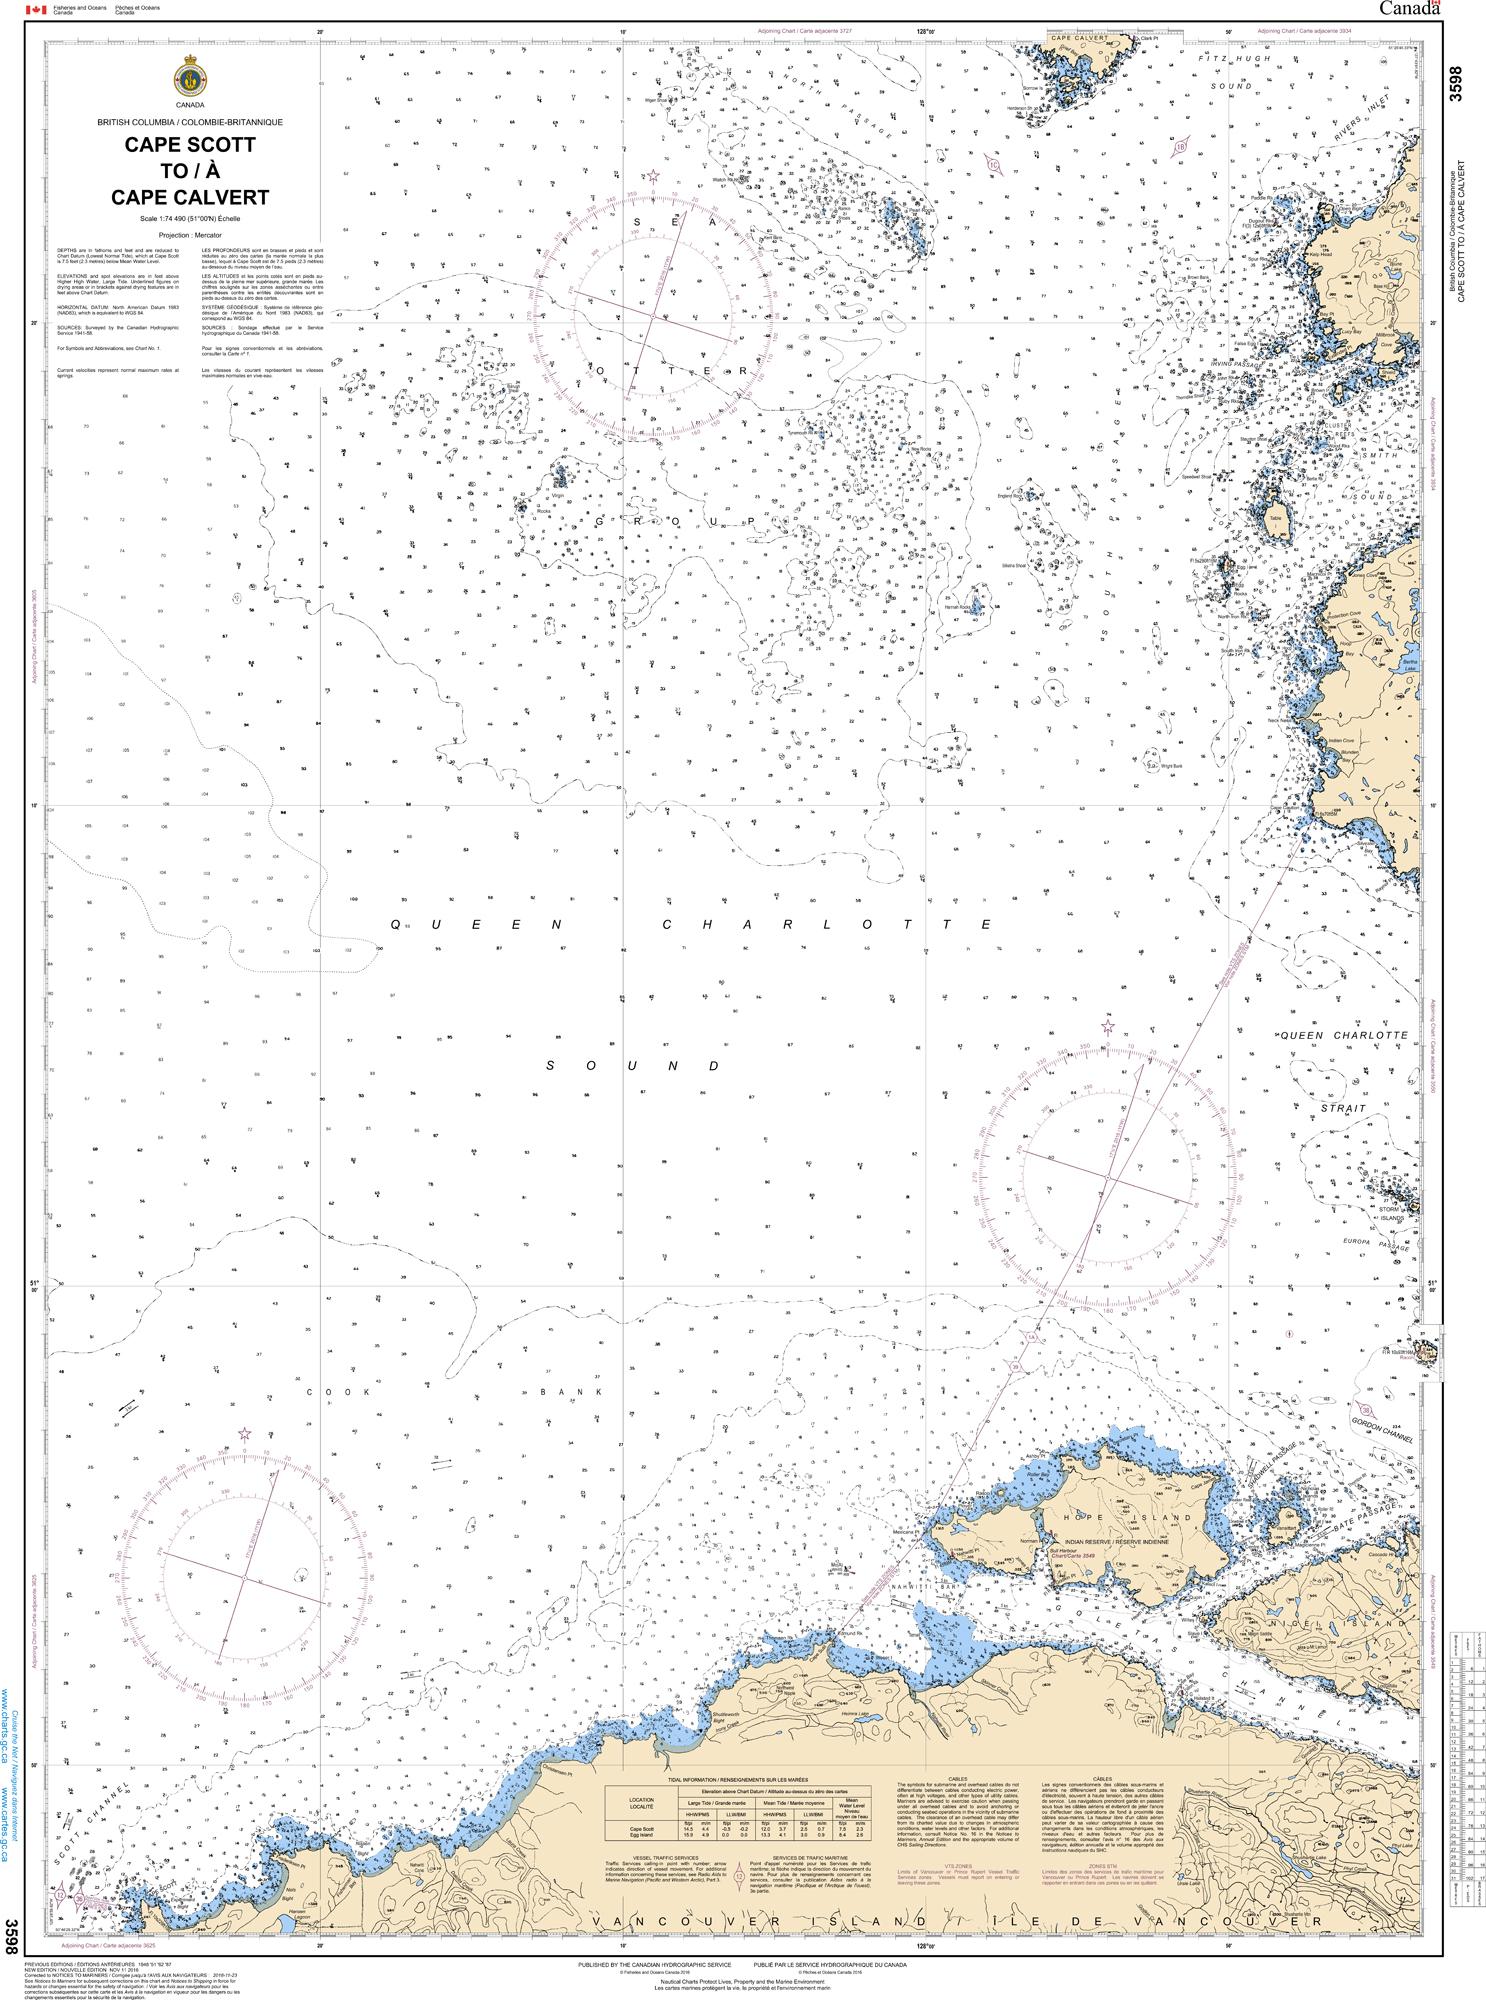 Pacific Region, CHS Chart 3598: Cape Scott to Cape Calvert